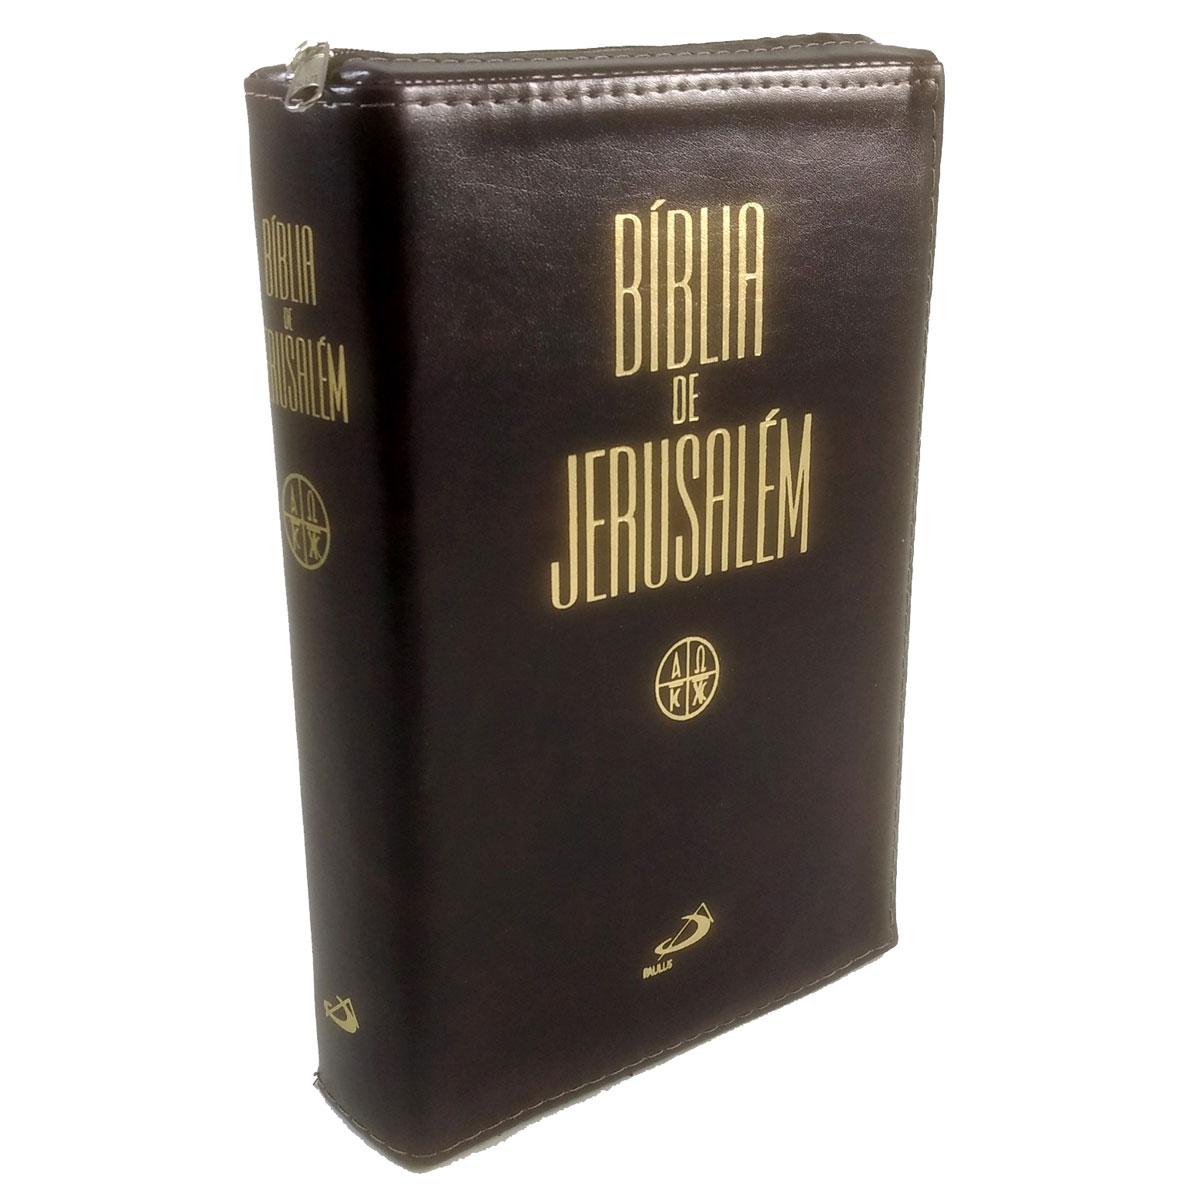 Biblia Sagrada Jerusalem Media Ziper  - VindVedShop - Distribuidora Catolica